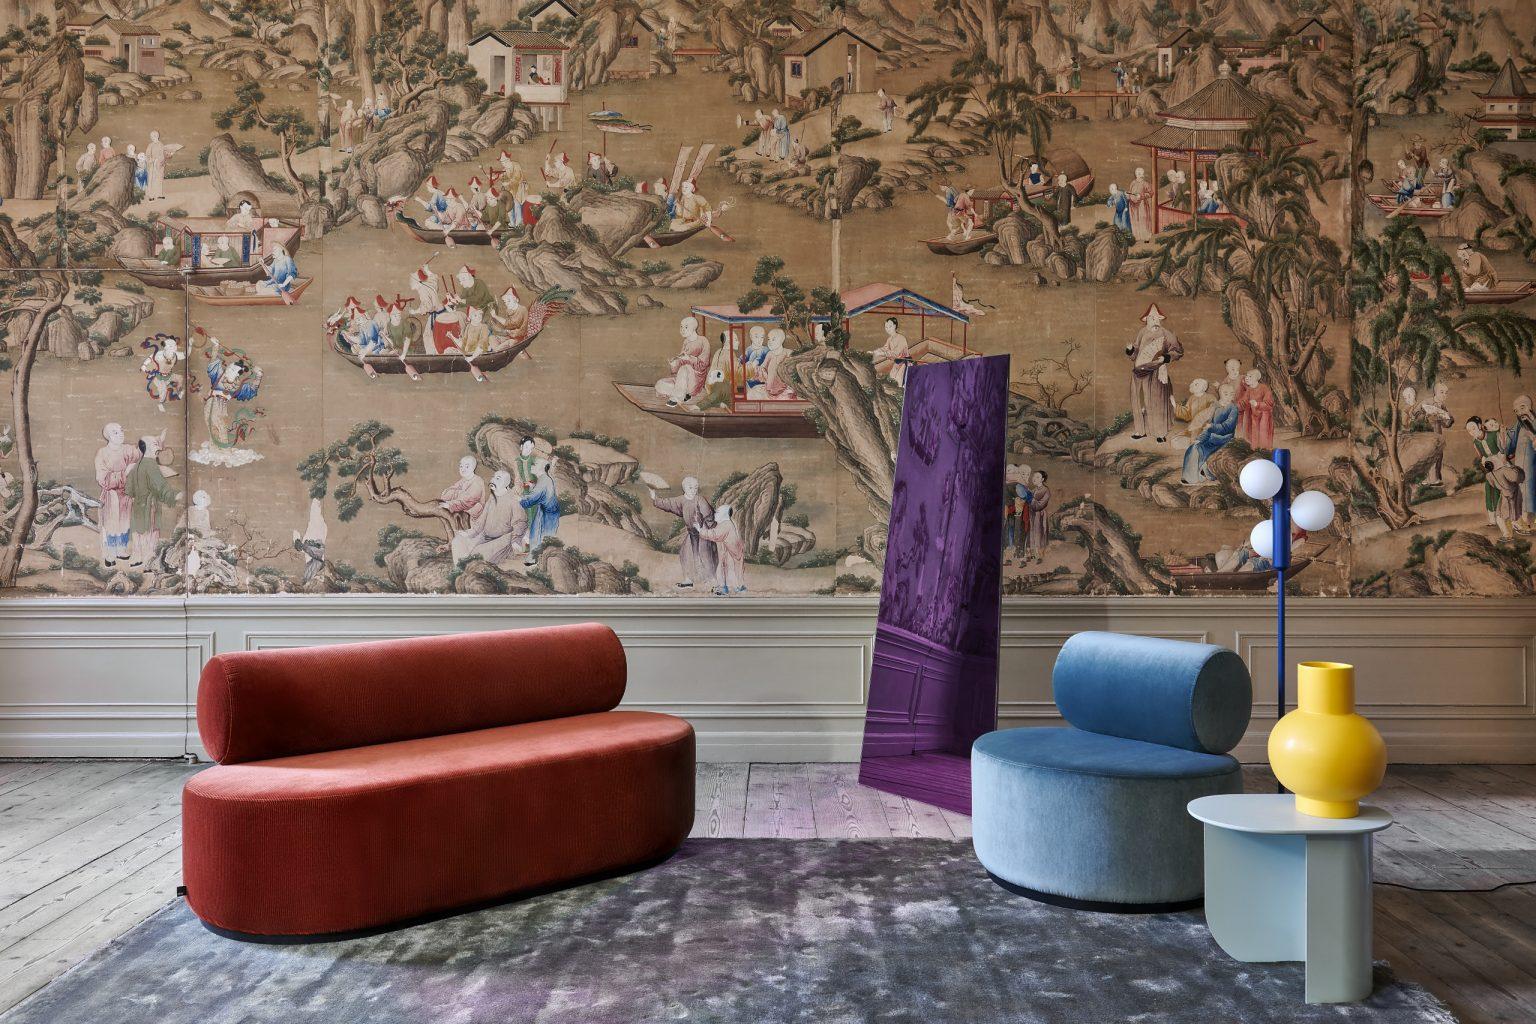 Biennale Interieur - Belgium's leading design and interior event - Sinclair_sofa_150_cord_copper_sinclair_lounge_chair_royal_turquoise_plateau_side_table_mint_kaktee_floor_blue.jpg